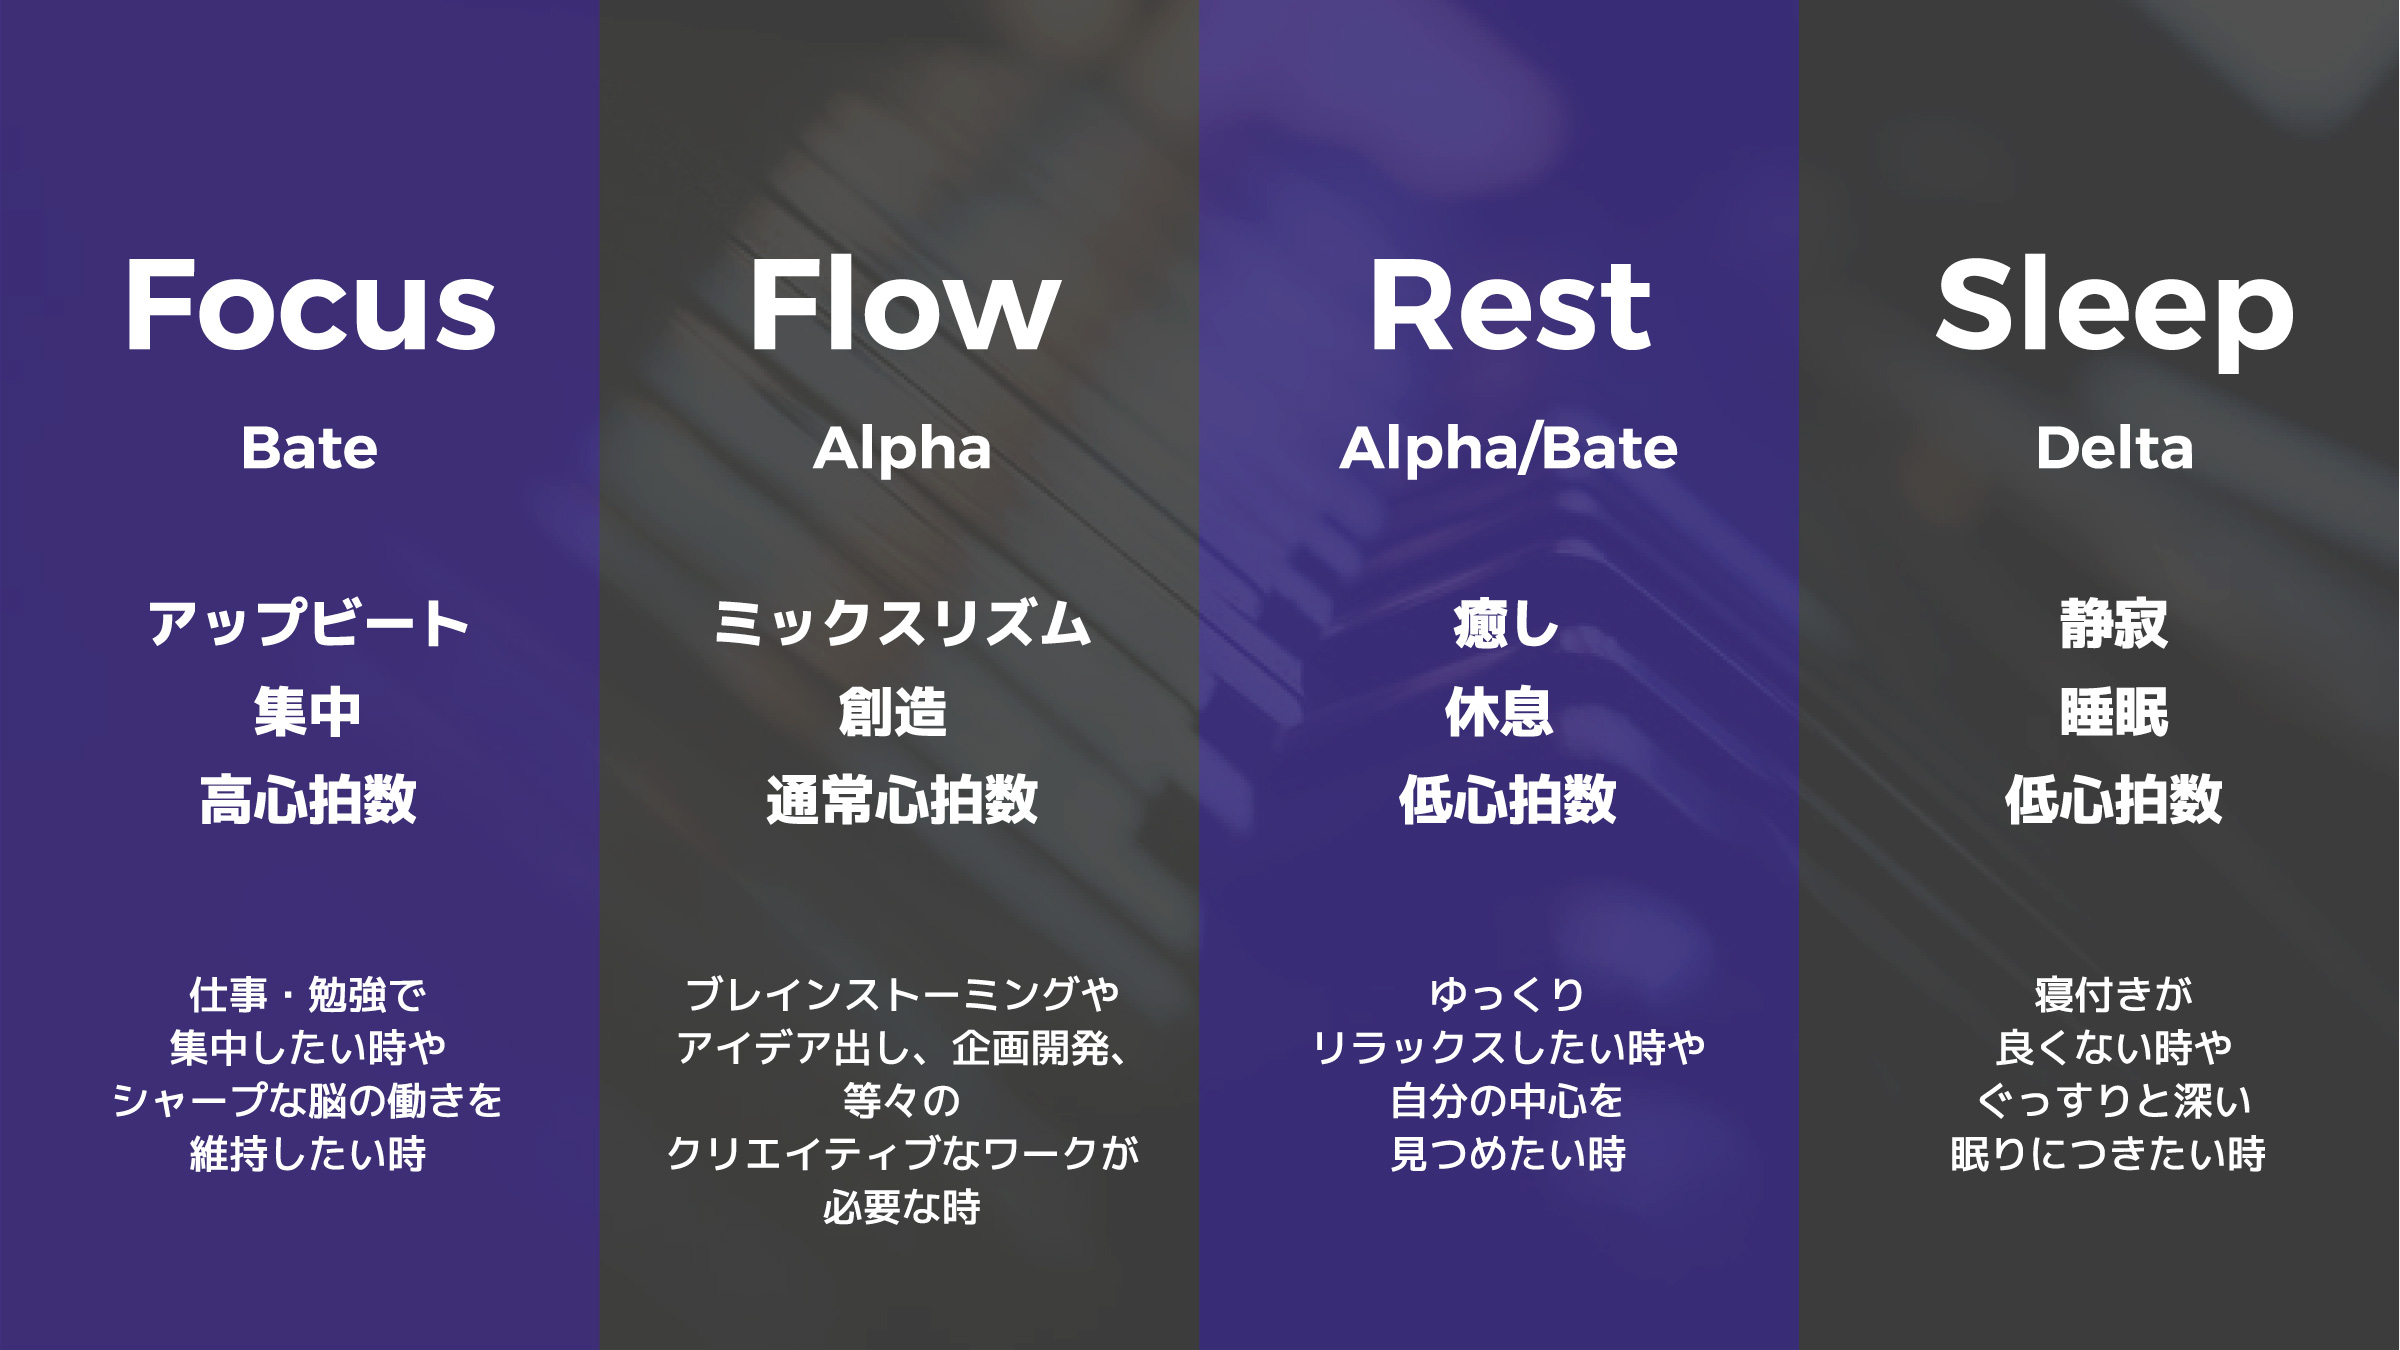 【Focus】Bate アップビート・集中・高心拍数/【Flow】Alpha ミックスリズム・創造 ・通常心拍数/【Rest】Bate アップビート・集中・高心拍/【Sleep】Delta 静寂・睡眠・低心拍数